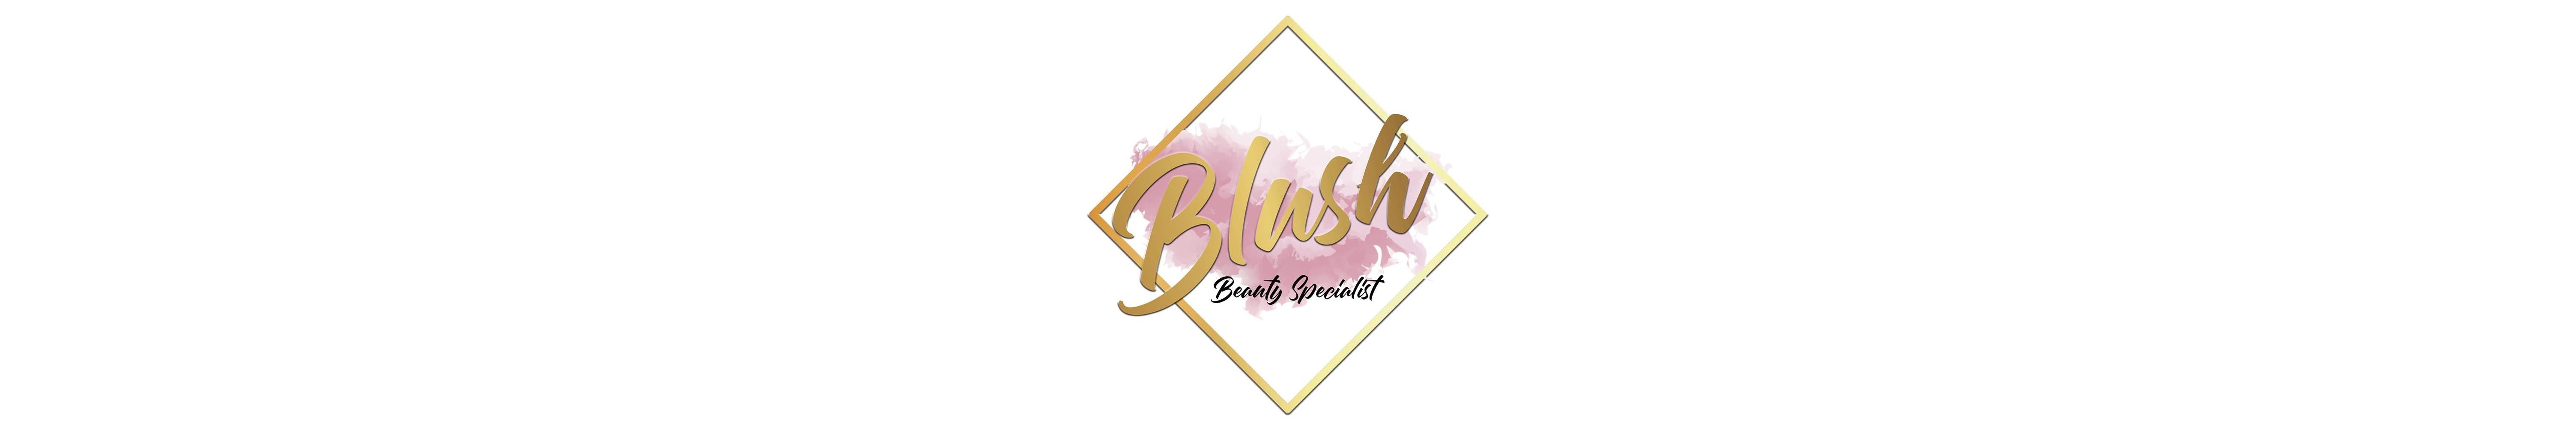 Blush Beauty Specialists